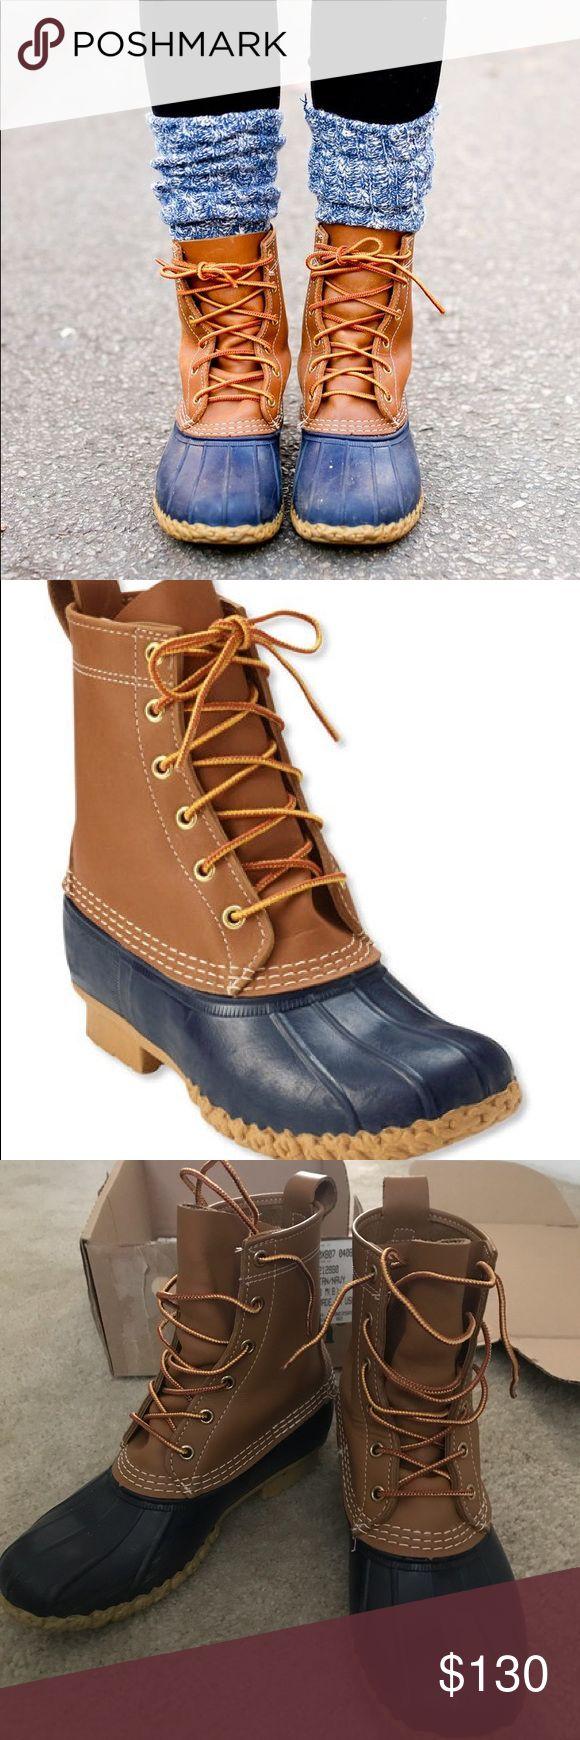 "LL Bean Boots Women's 8 8"" Bean Boots Women's Tan/Navy Worn once - perfect condition L.L. Bean Shoes Winter & Rain Boots"